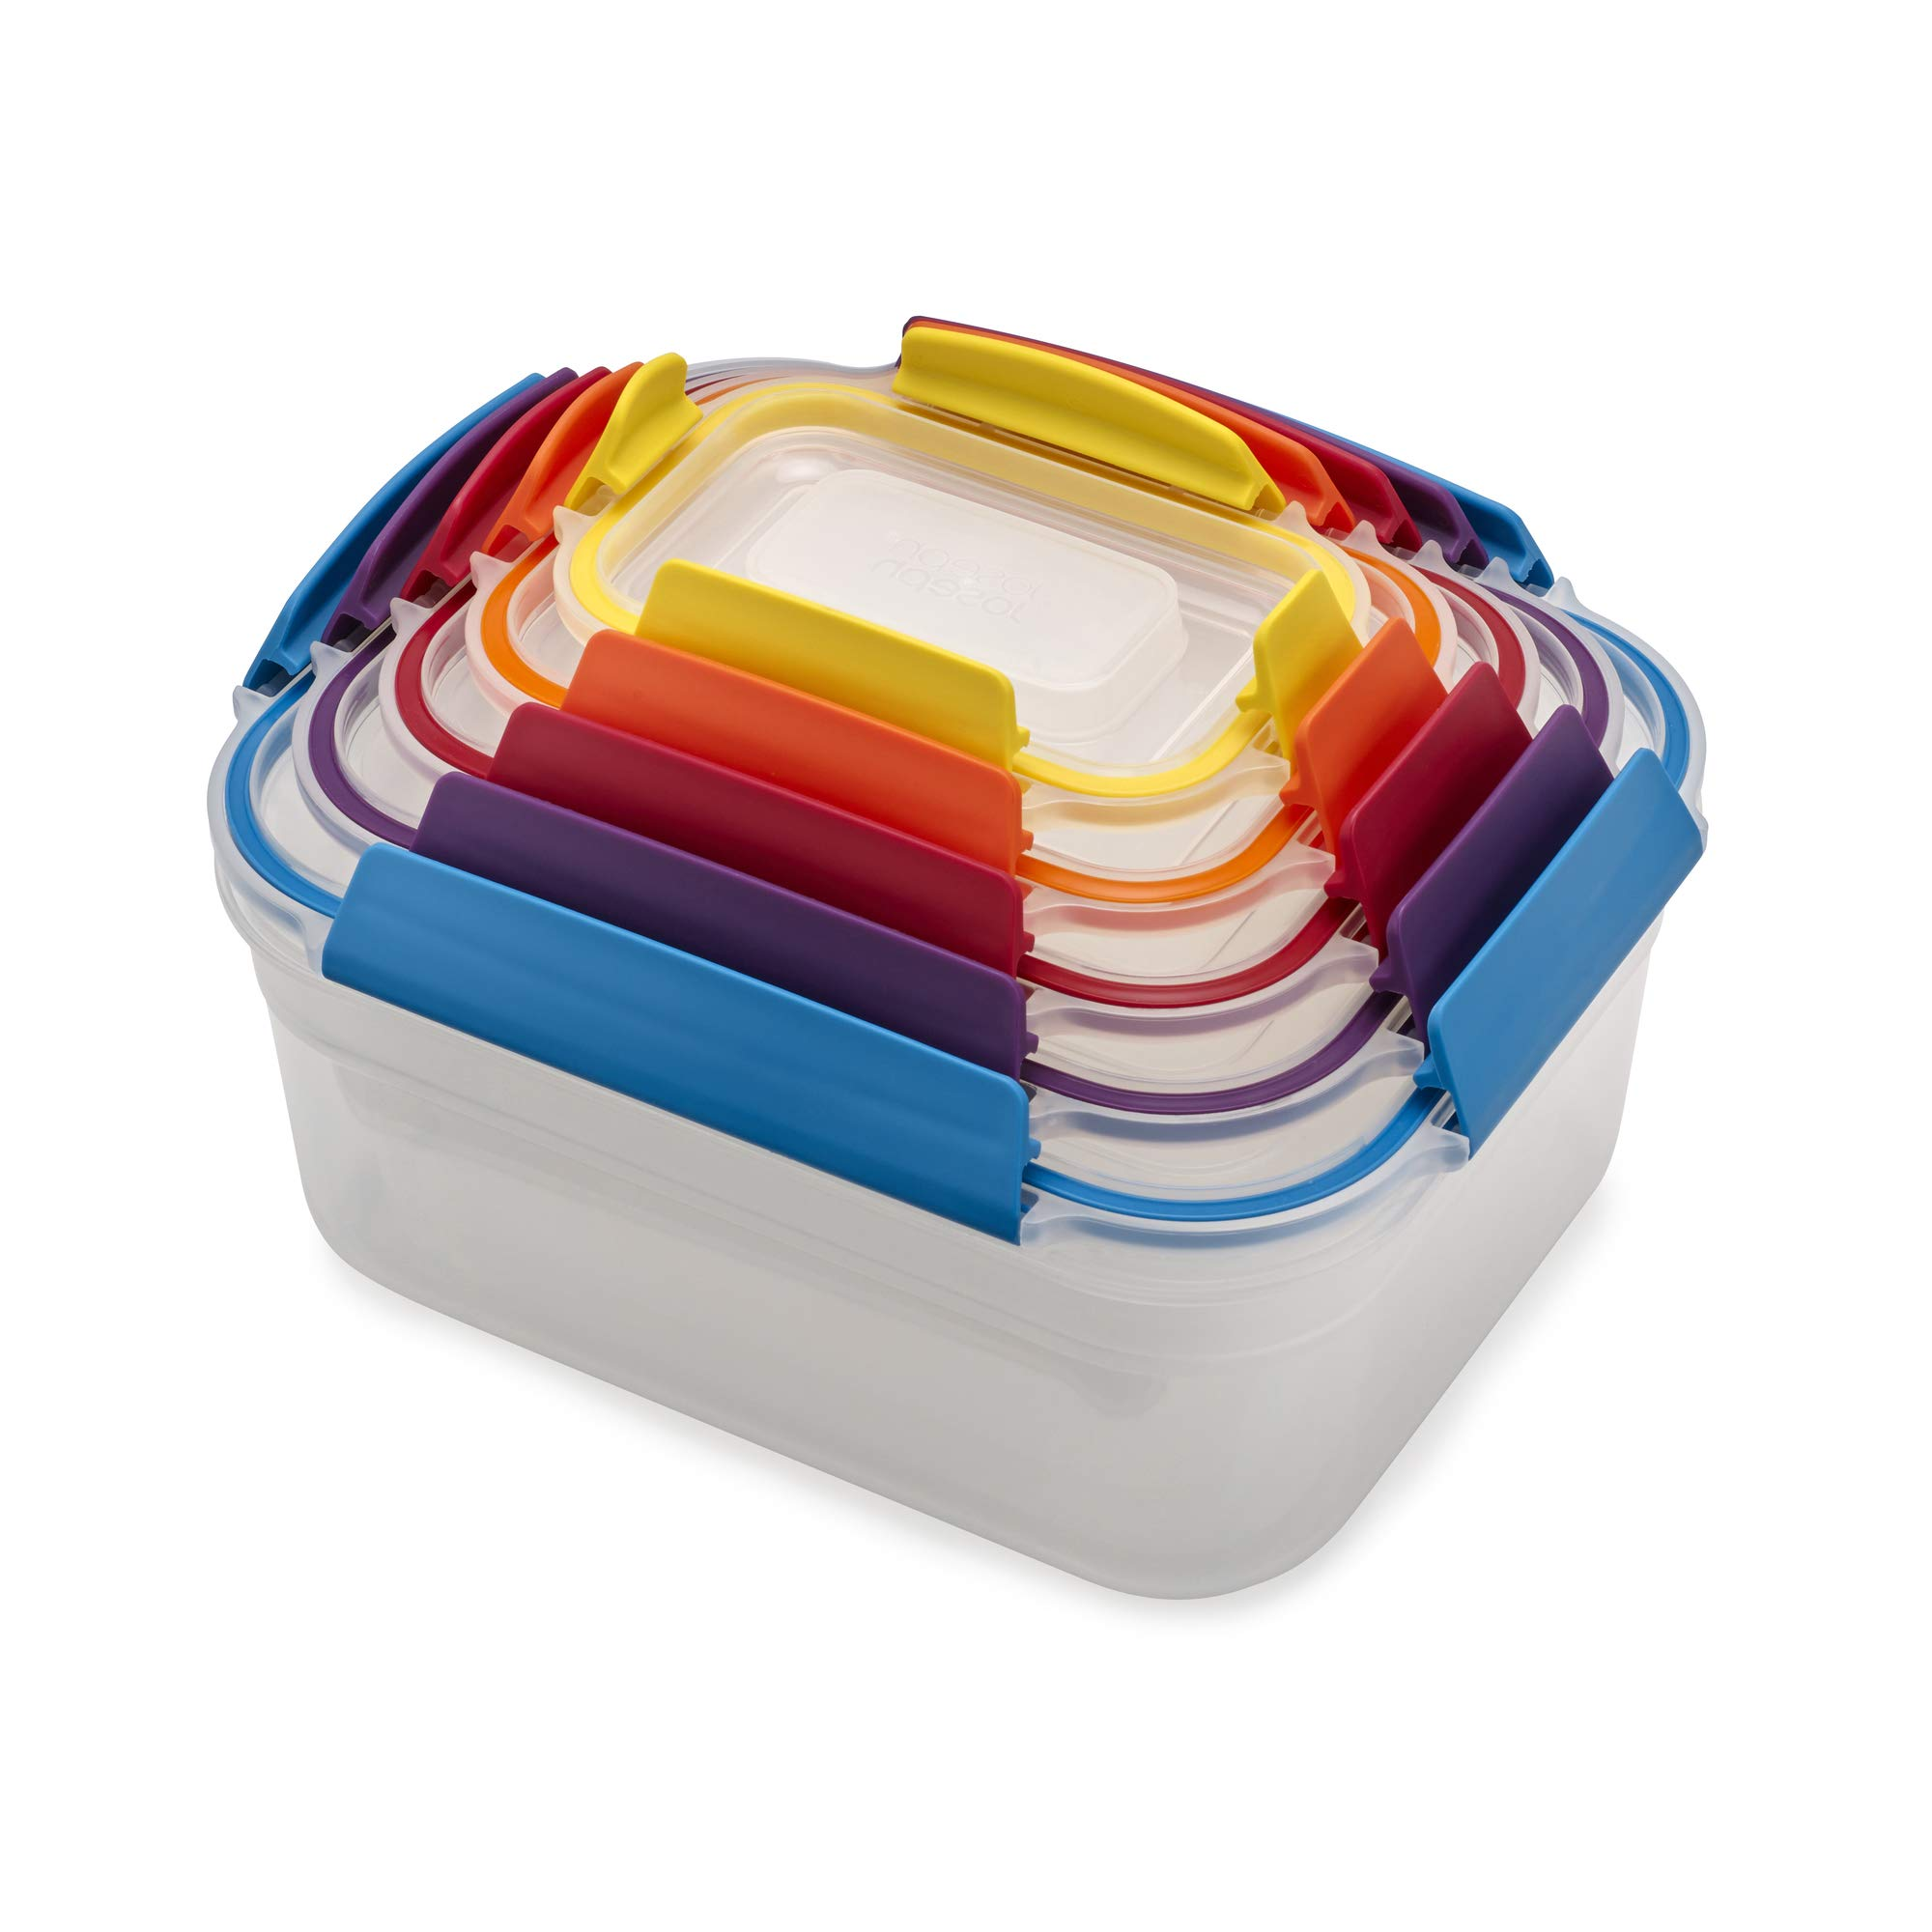 Joseph Joseph 81098 Nest Lock Plastic Food Storage Container Set with Lockable Airtight Leakproof Lids, 10-piece, Multicolored